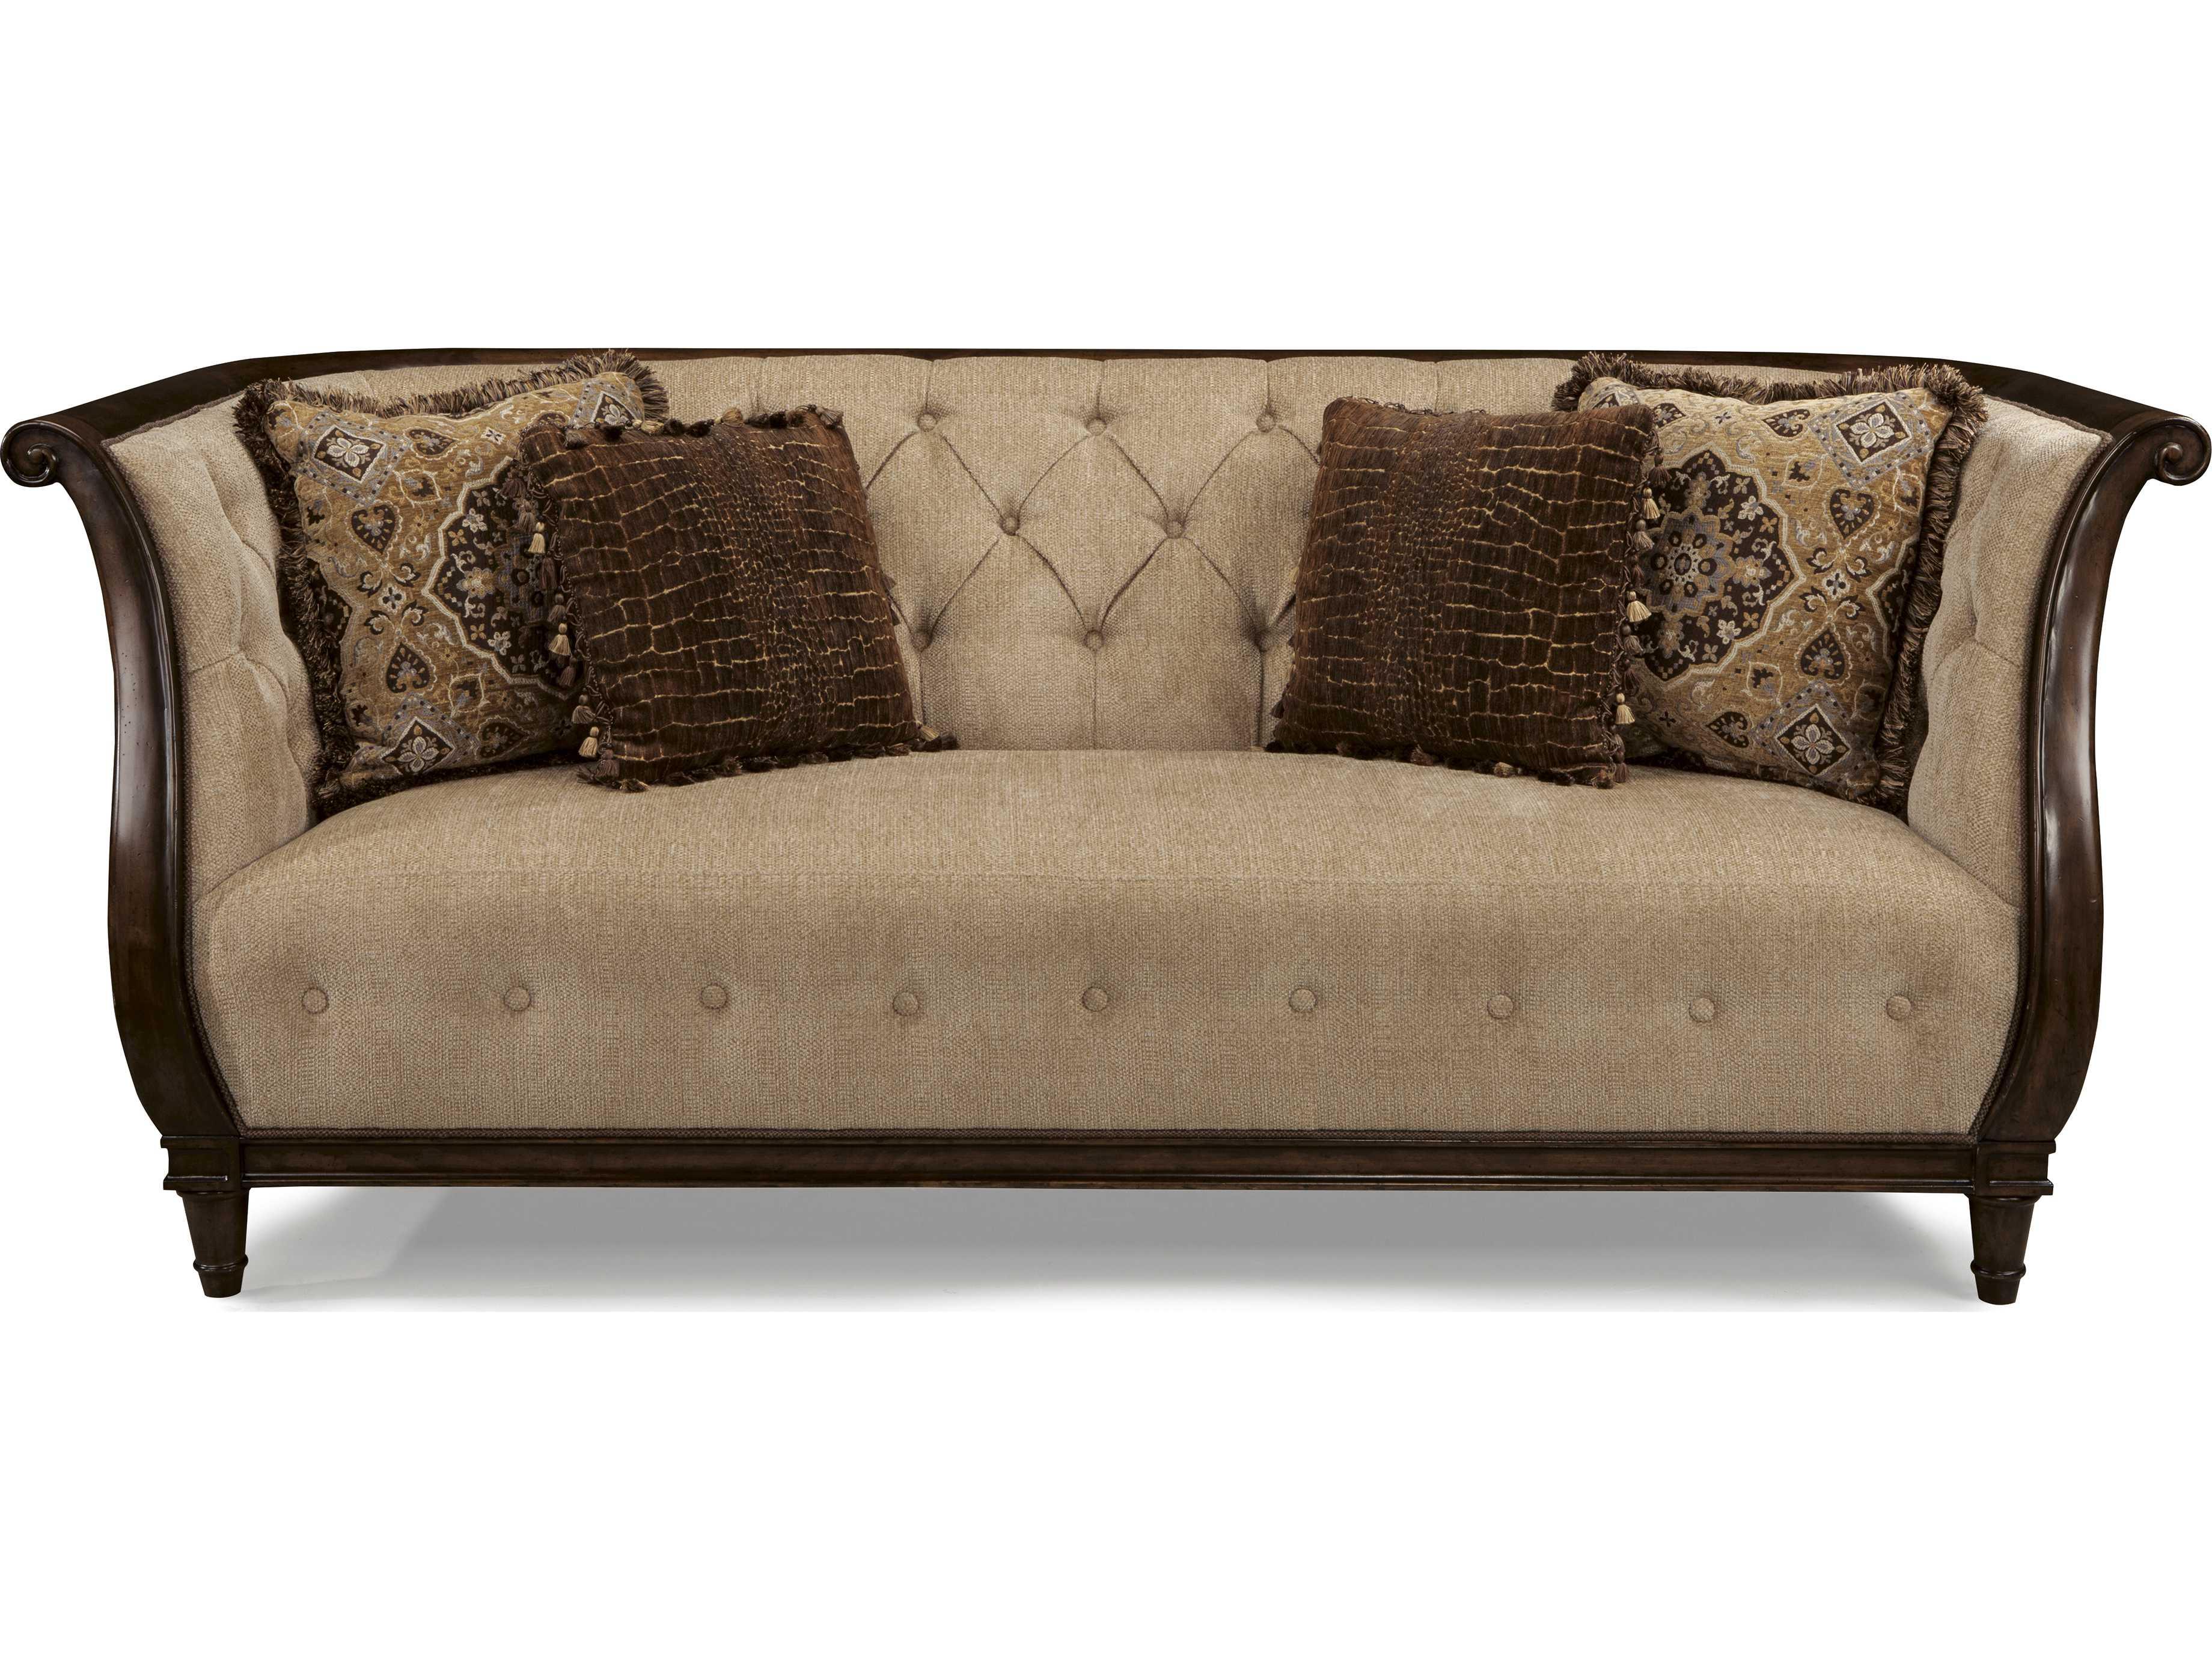 Art furniture ava rustic walnut melange beige tufted for Ava chaise lounge